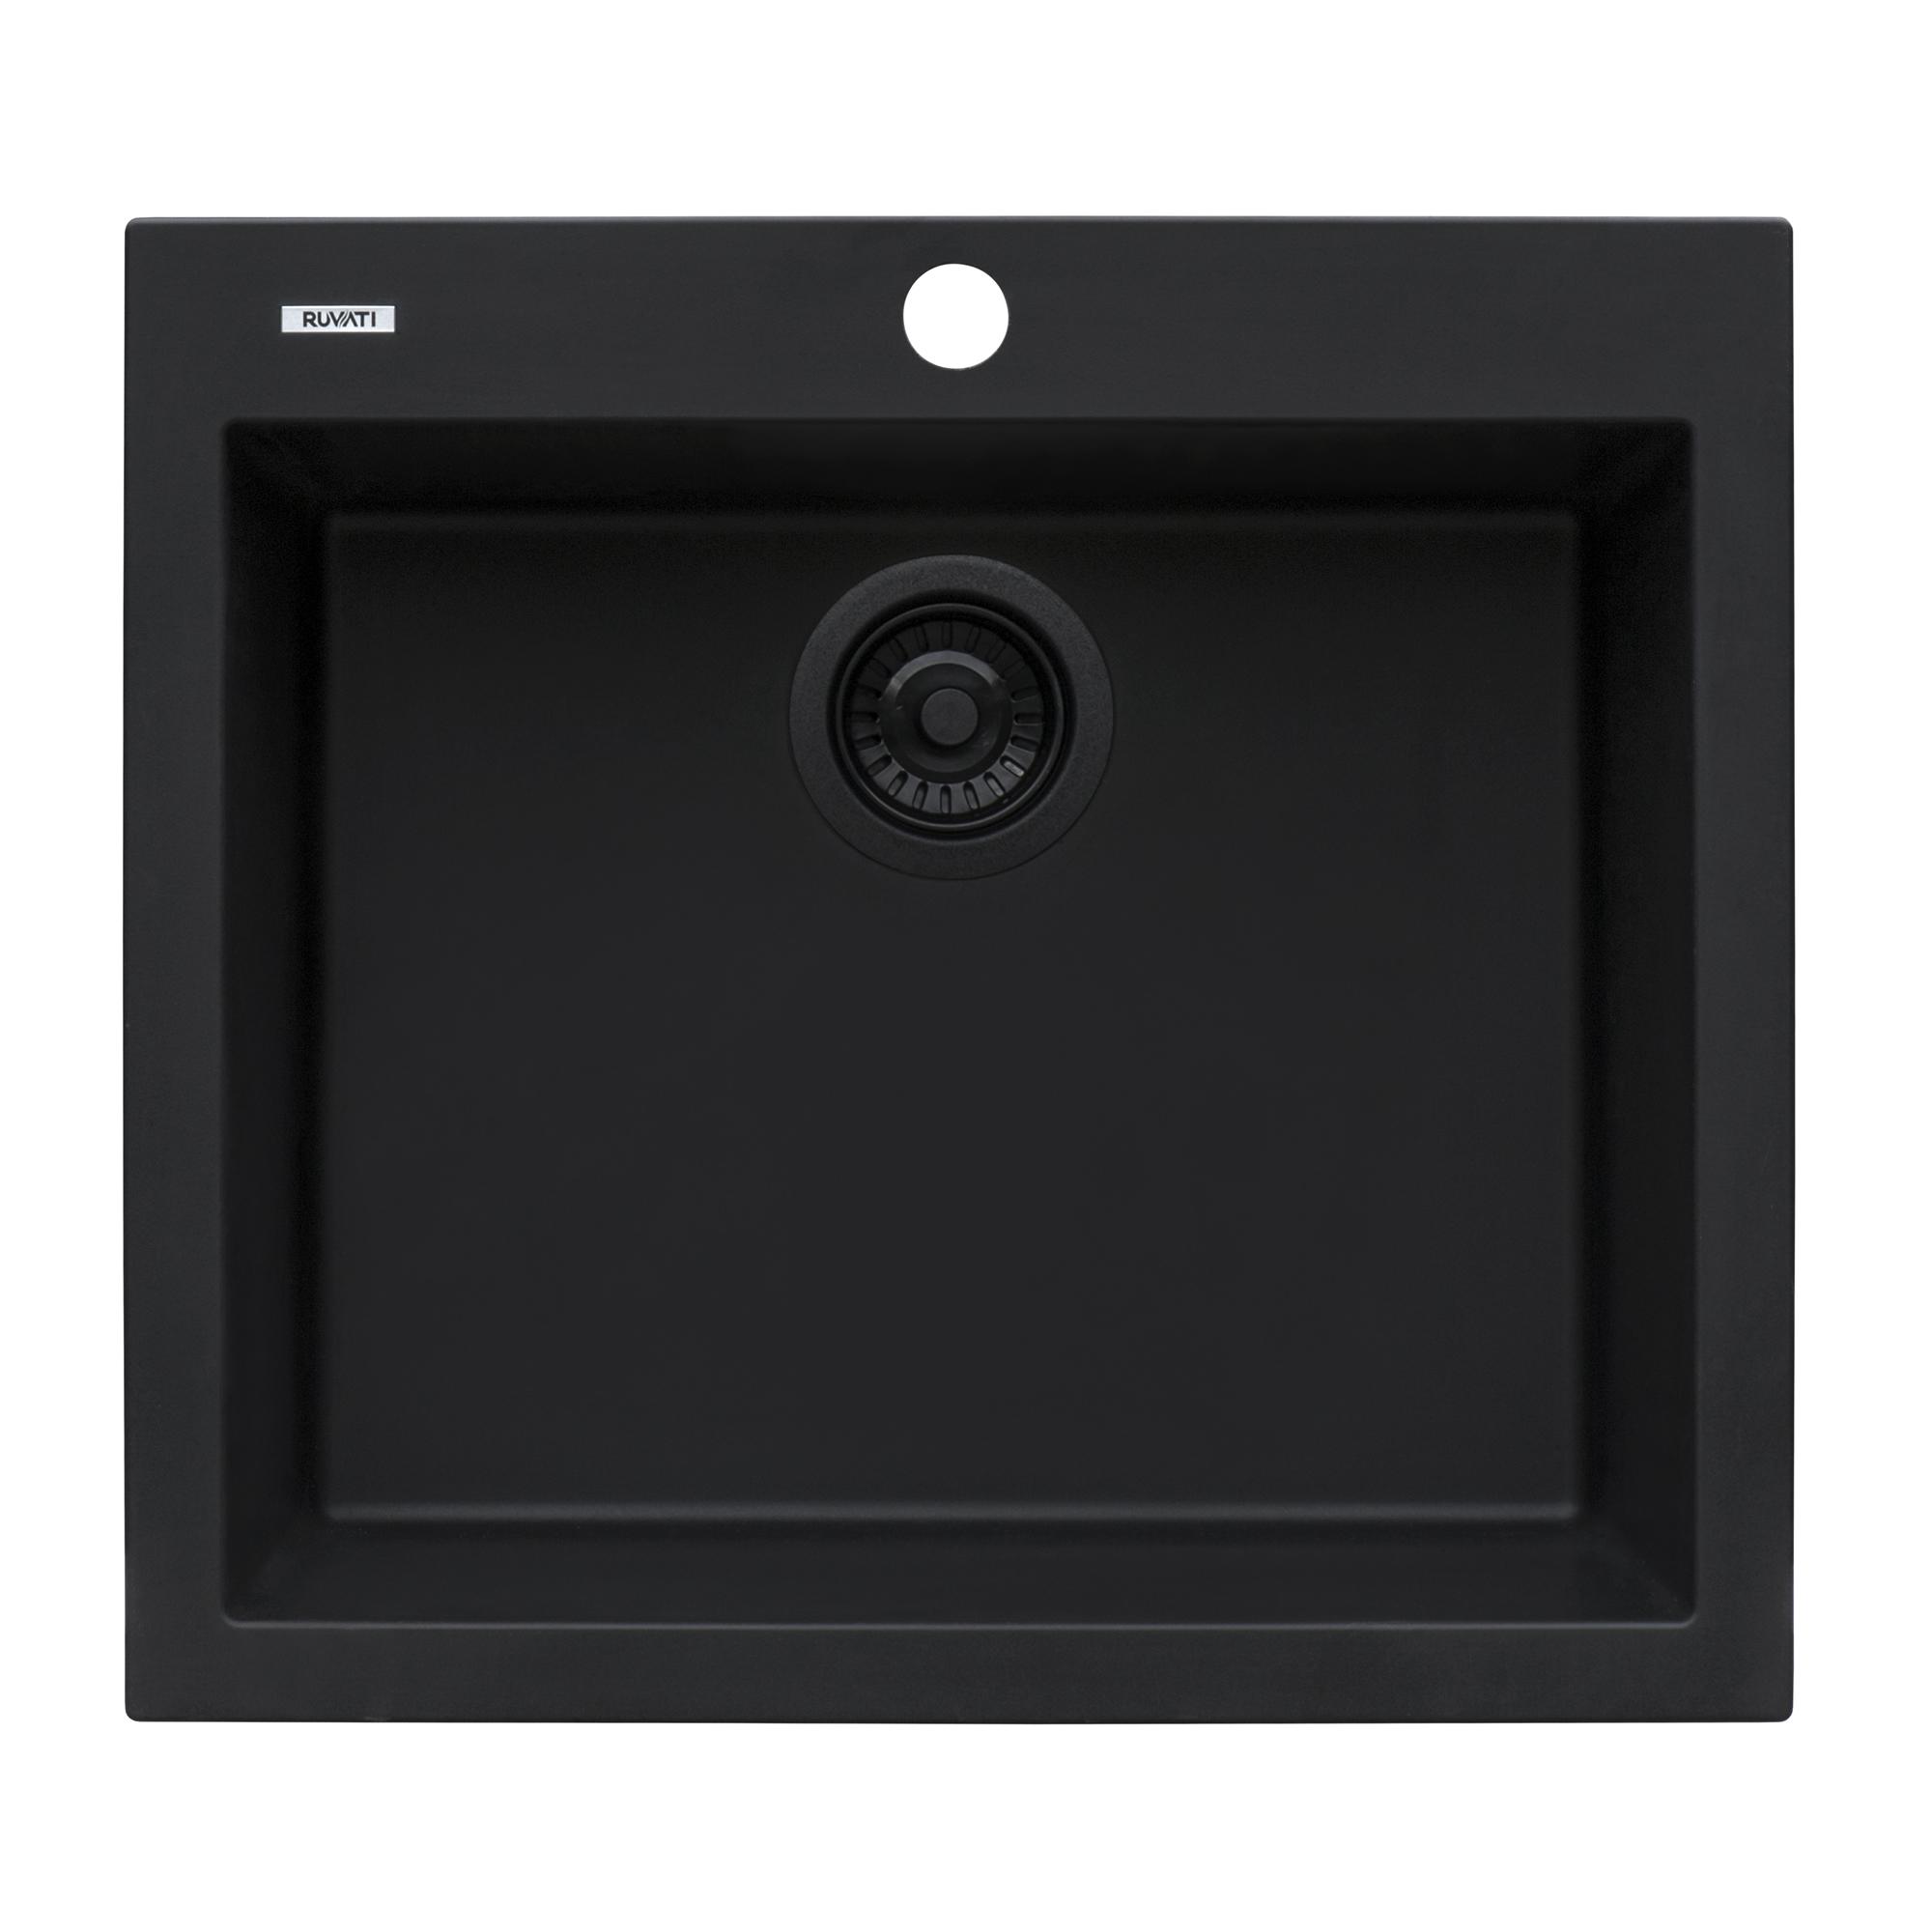 Ruvati 22 X 20 Inch Epigranite Drop In Topmount Granite Composite Single Bowl Kitchen Sink Midnight Black Rvg1022bk Ruvati Usa